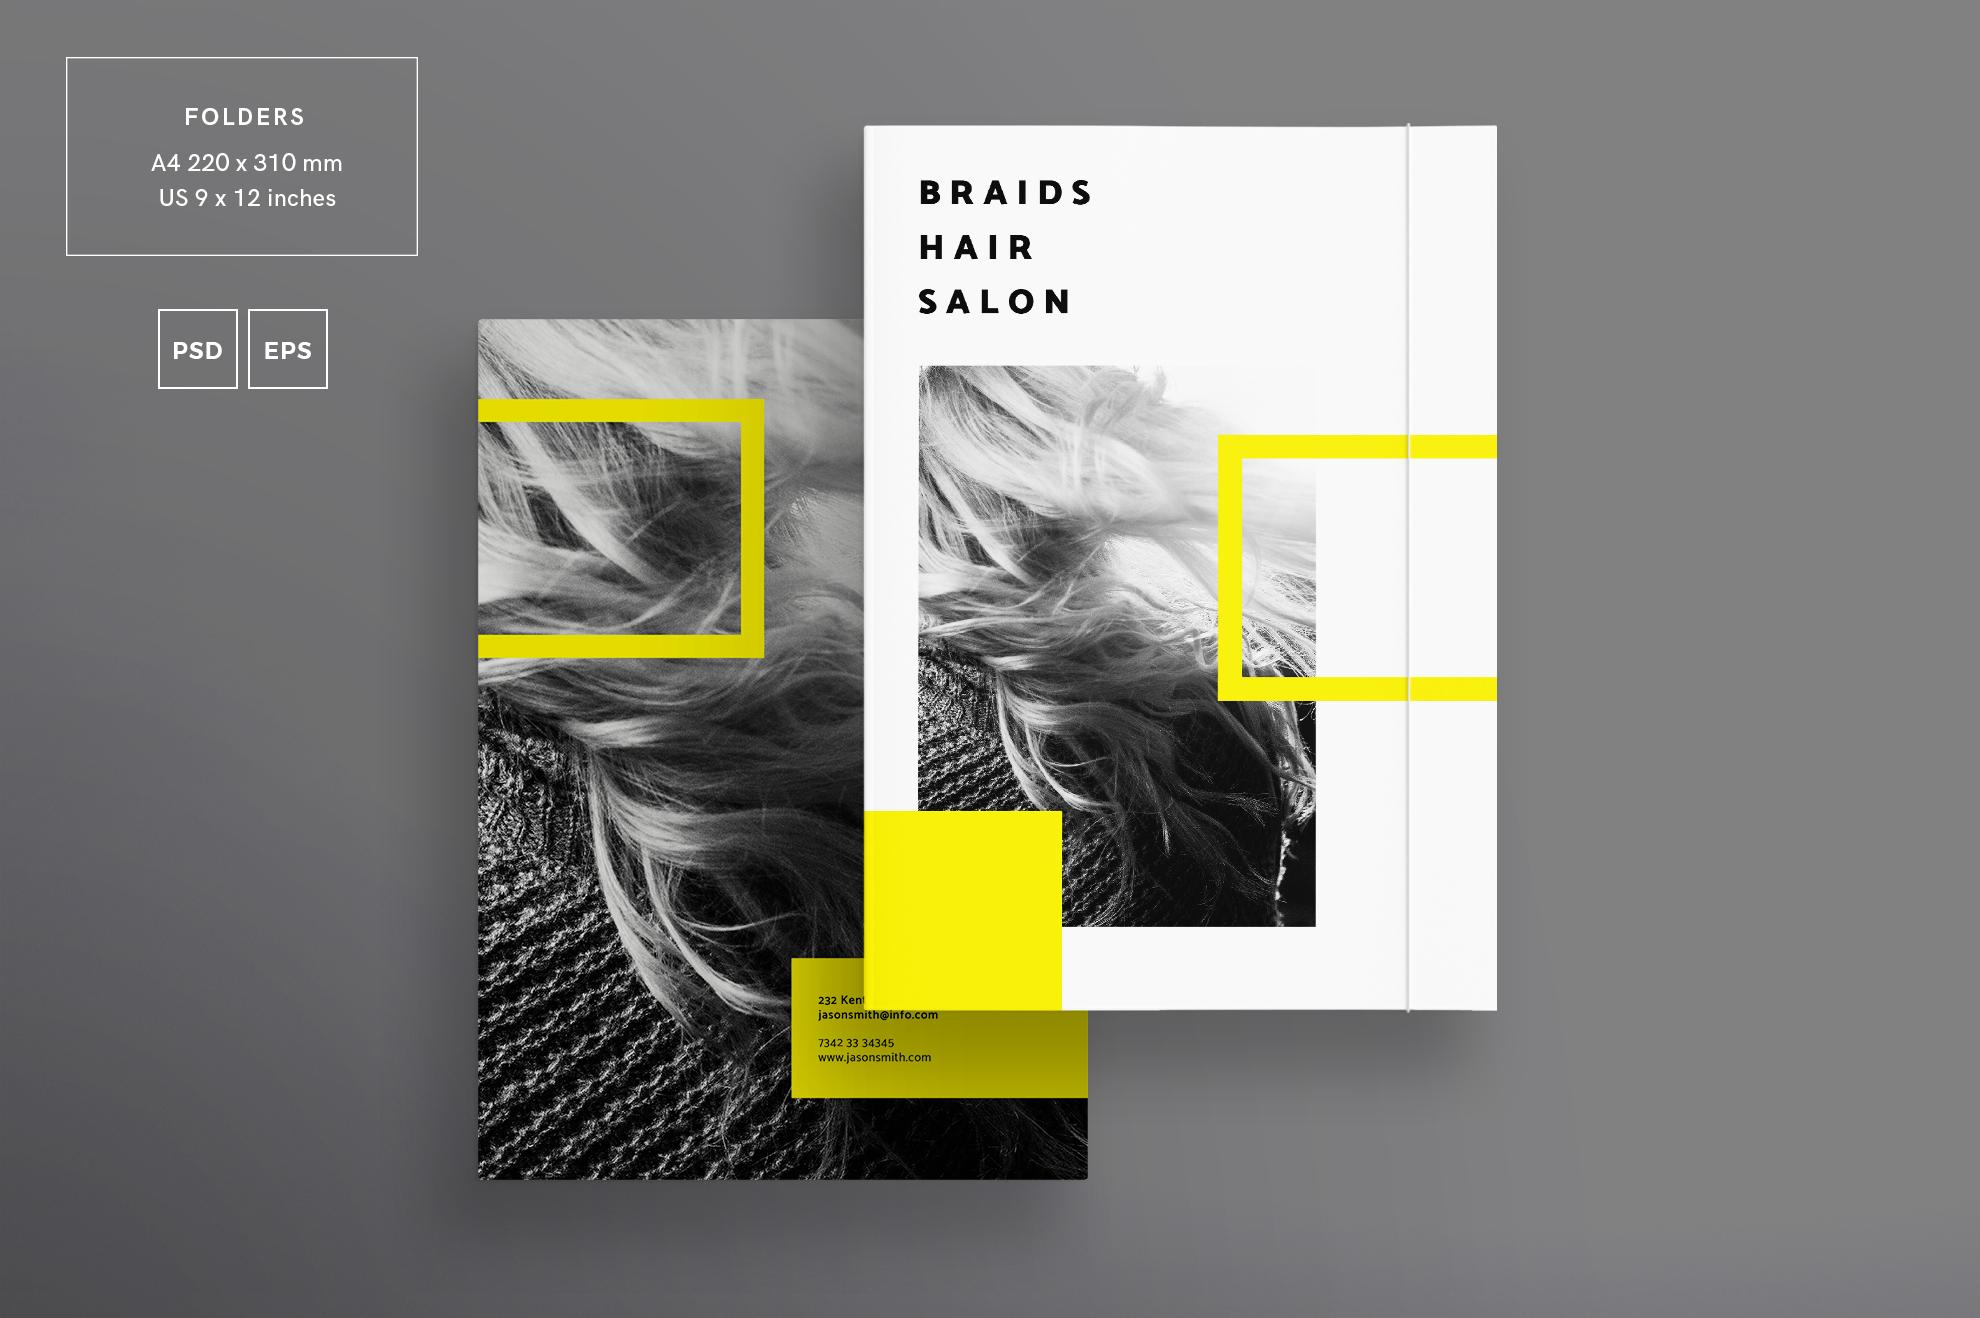 Hair Salon Barbershop Design Templates Bundle example image 6